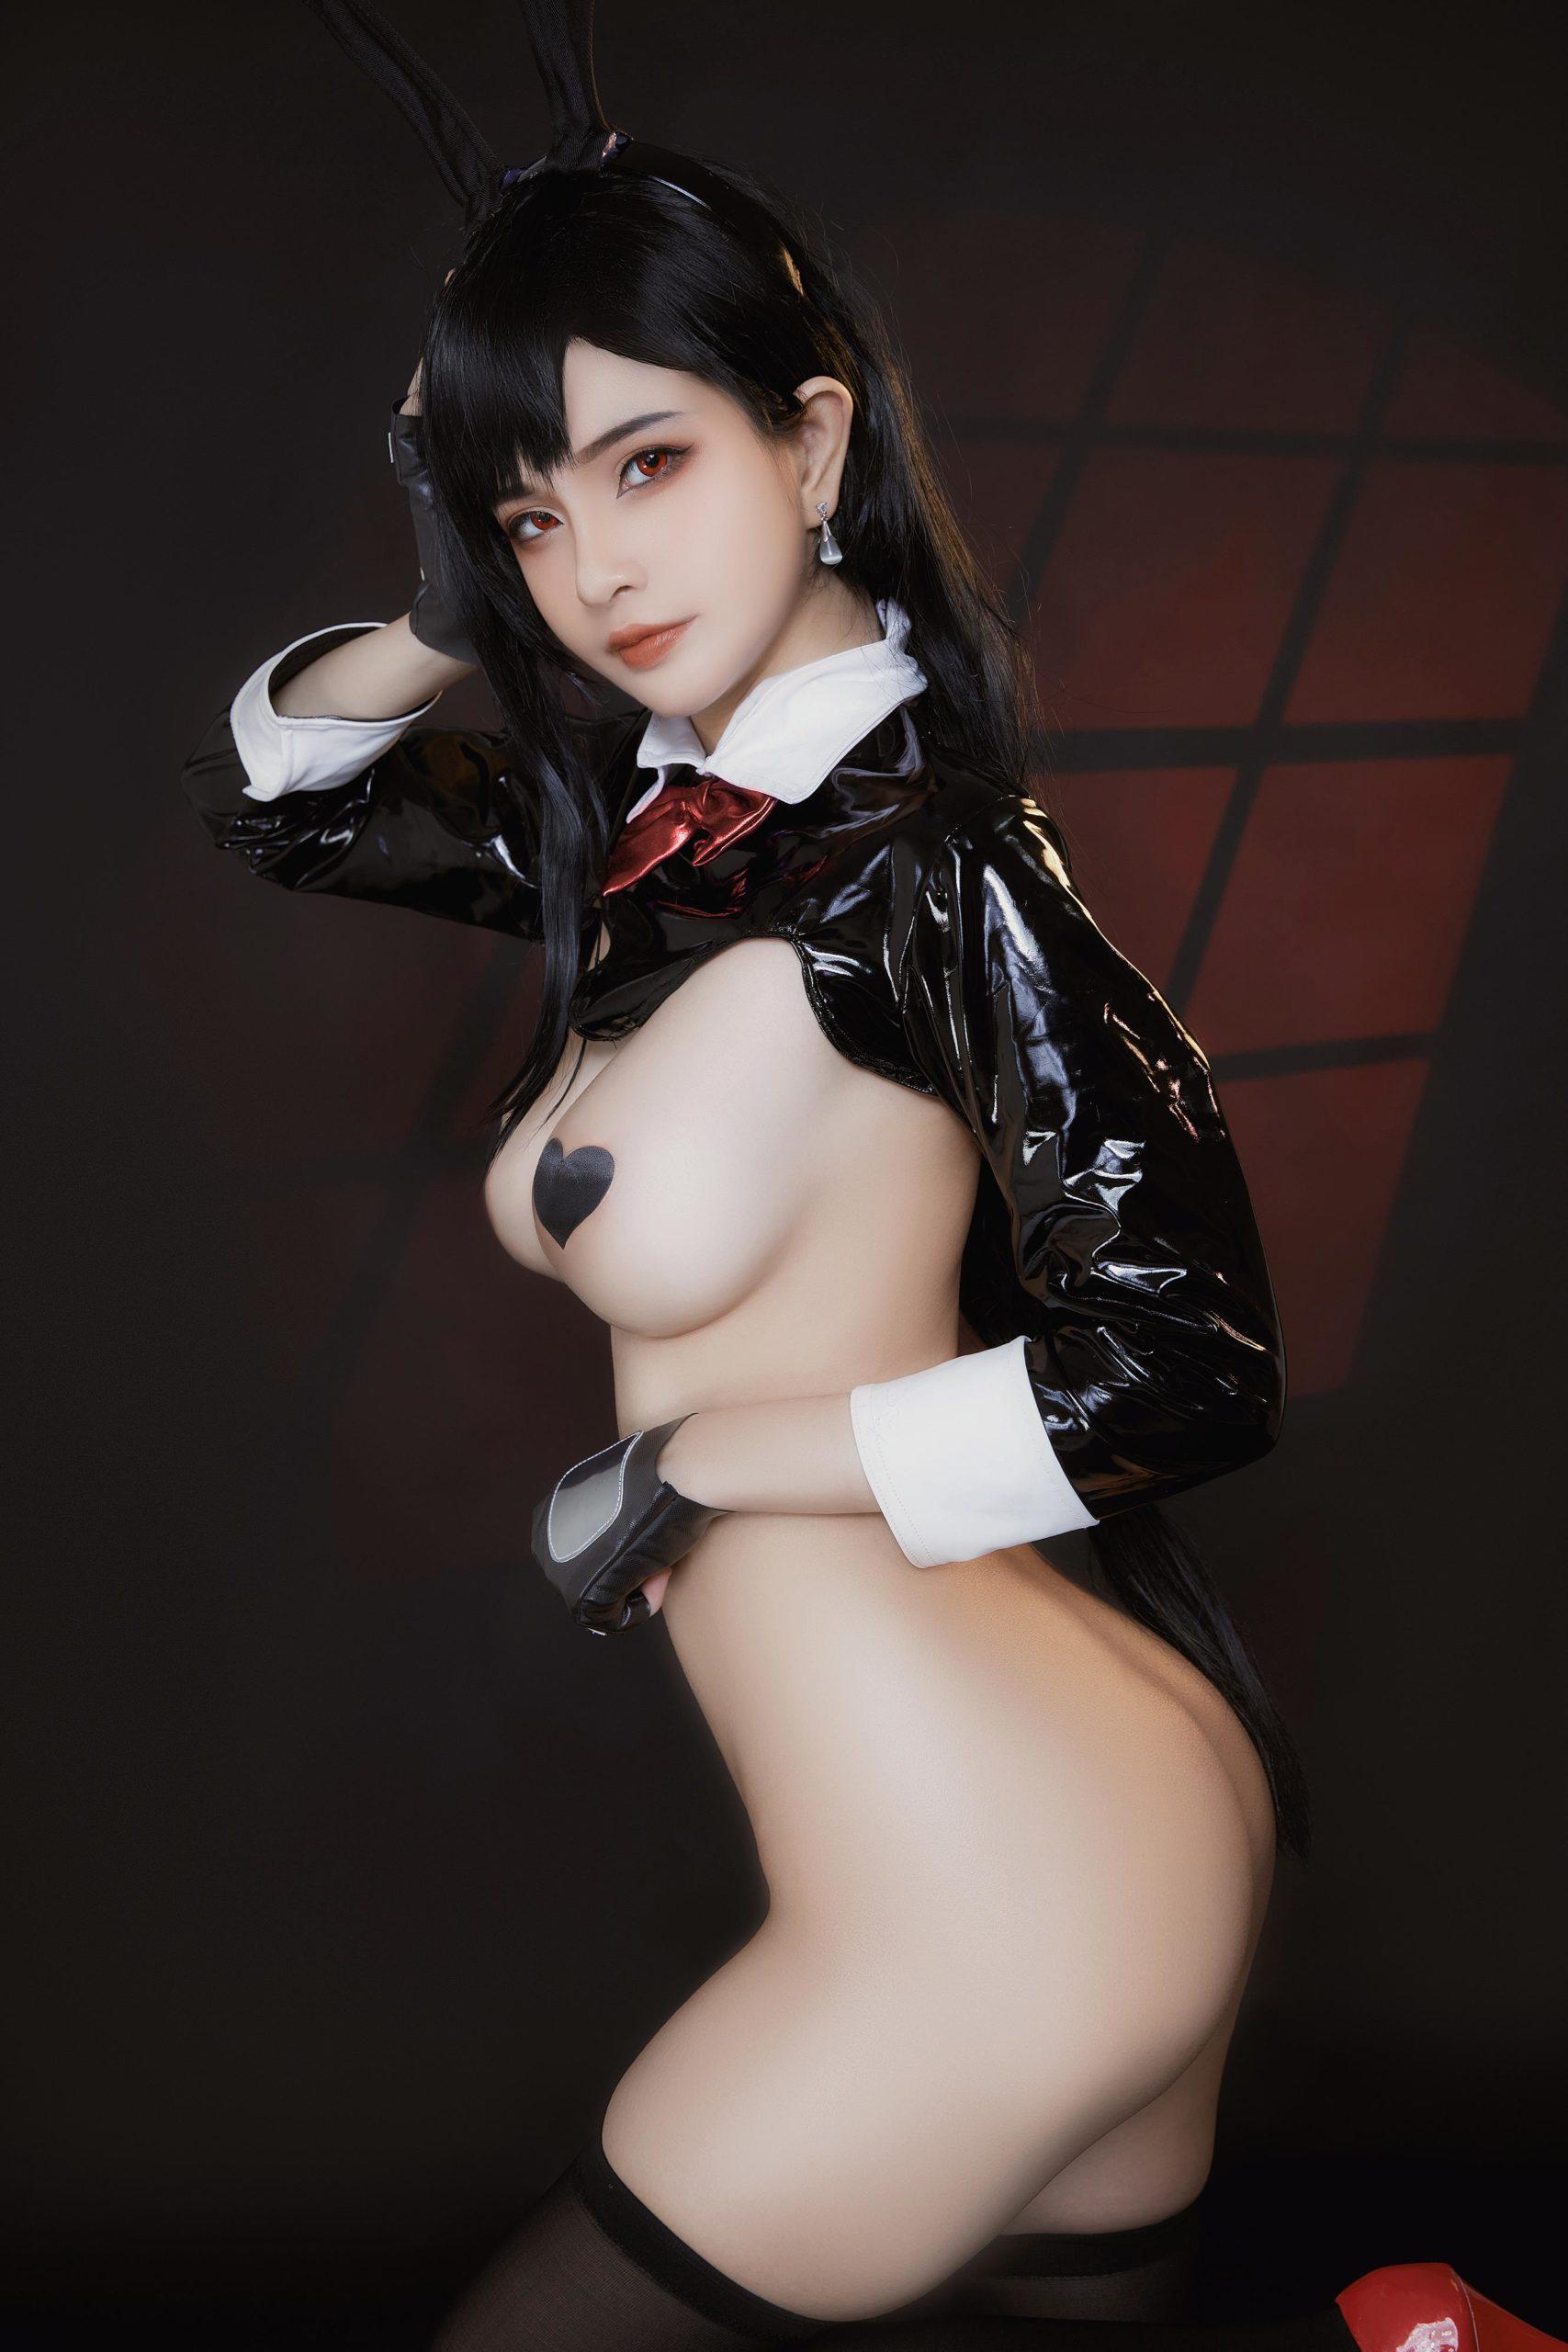 TifaLockhart Bunny Girl EroCosplay by Azami 13